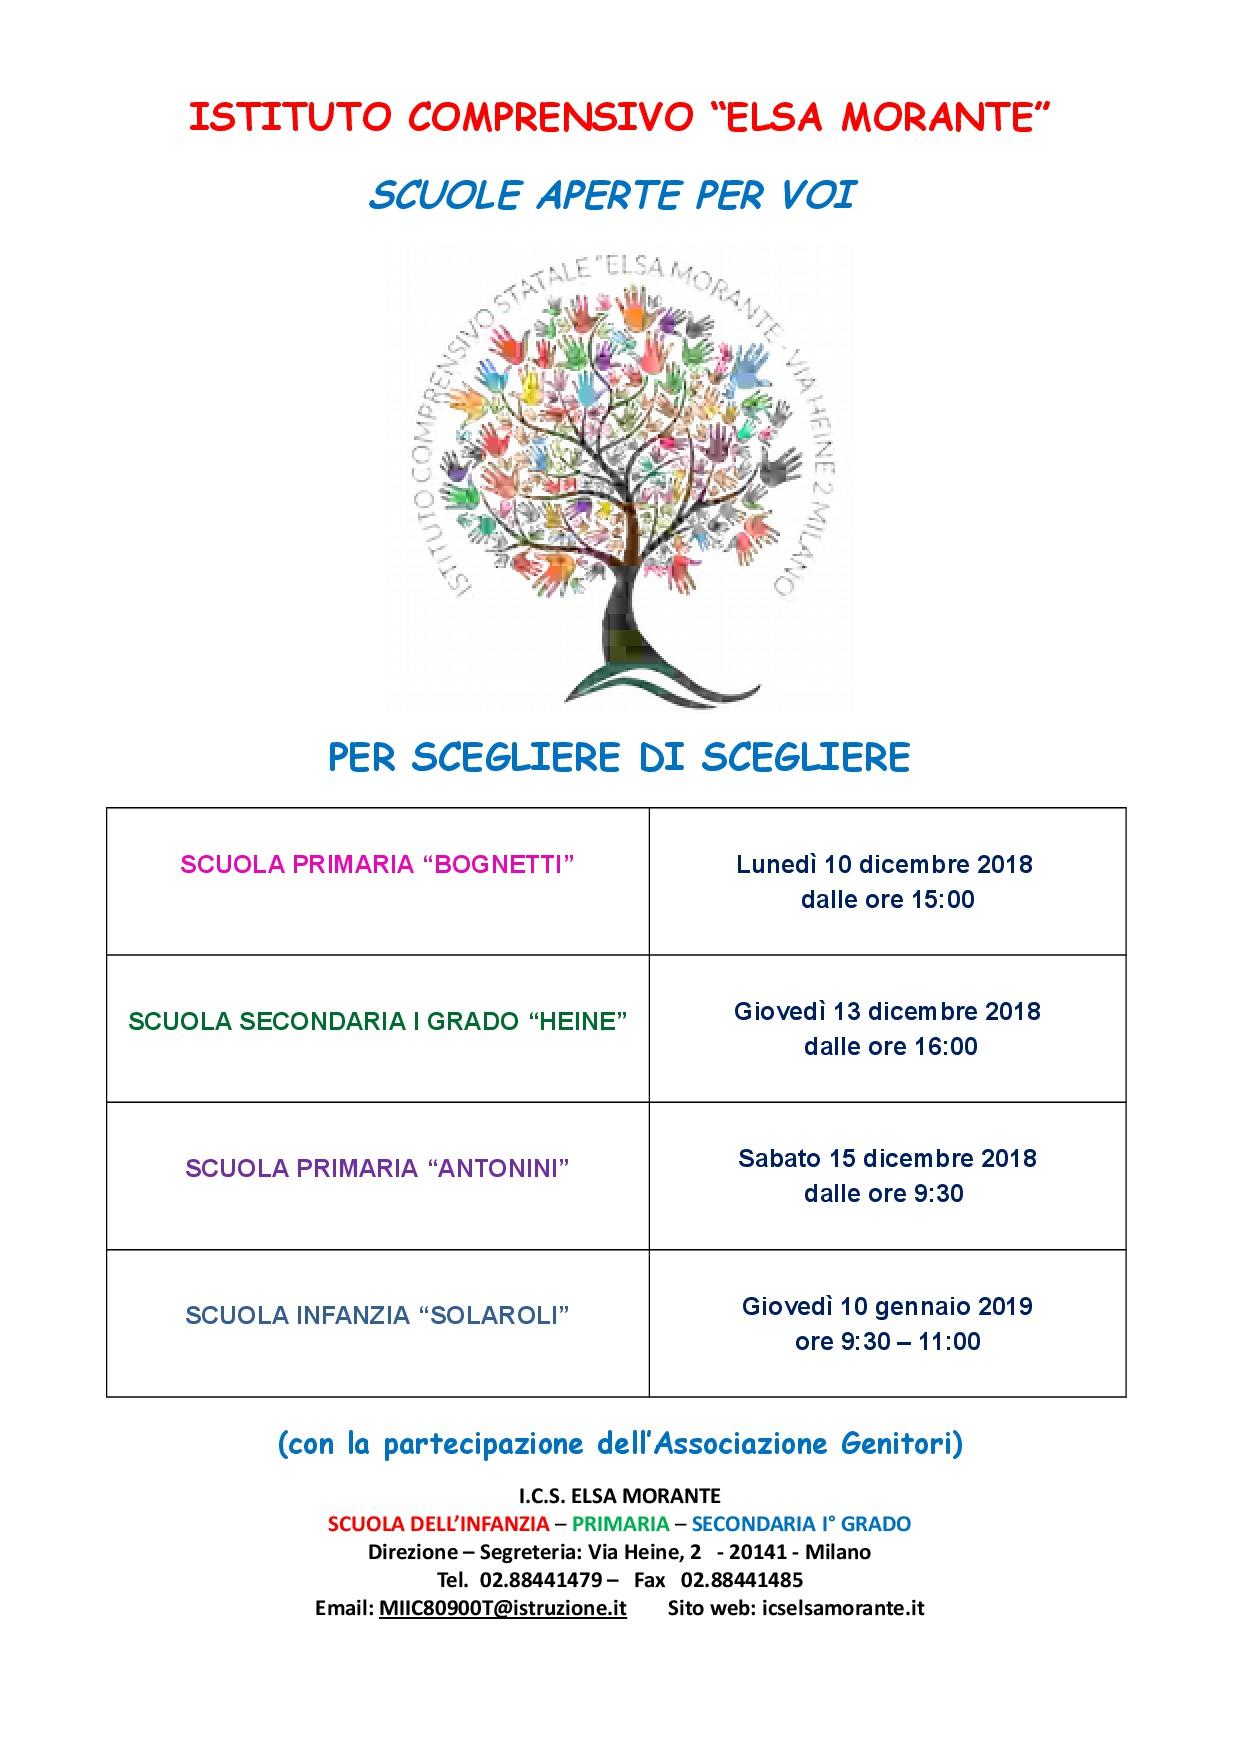 Calendario Scolastico Regione Lombardia.Calendario Scolastico